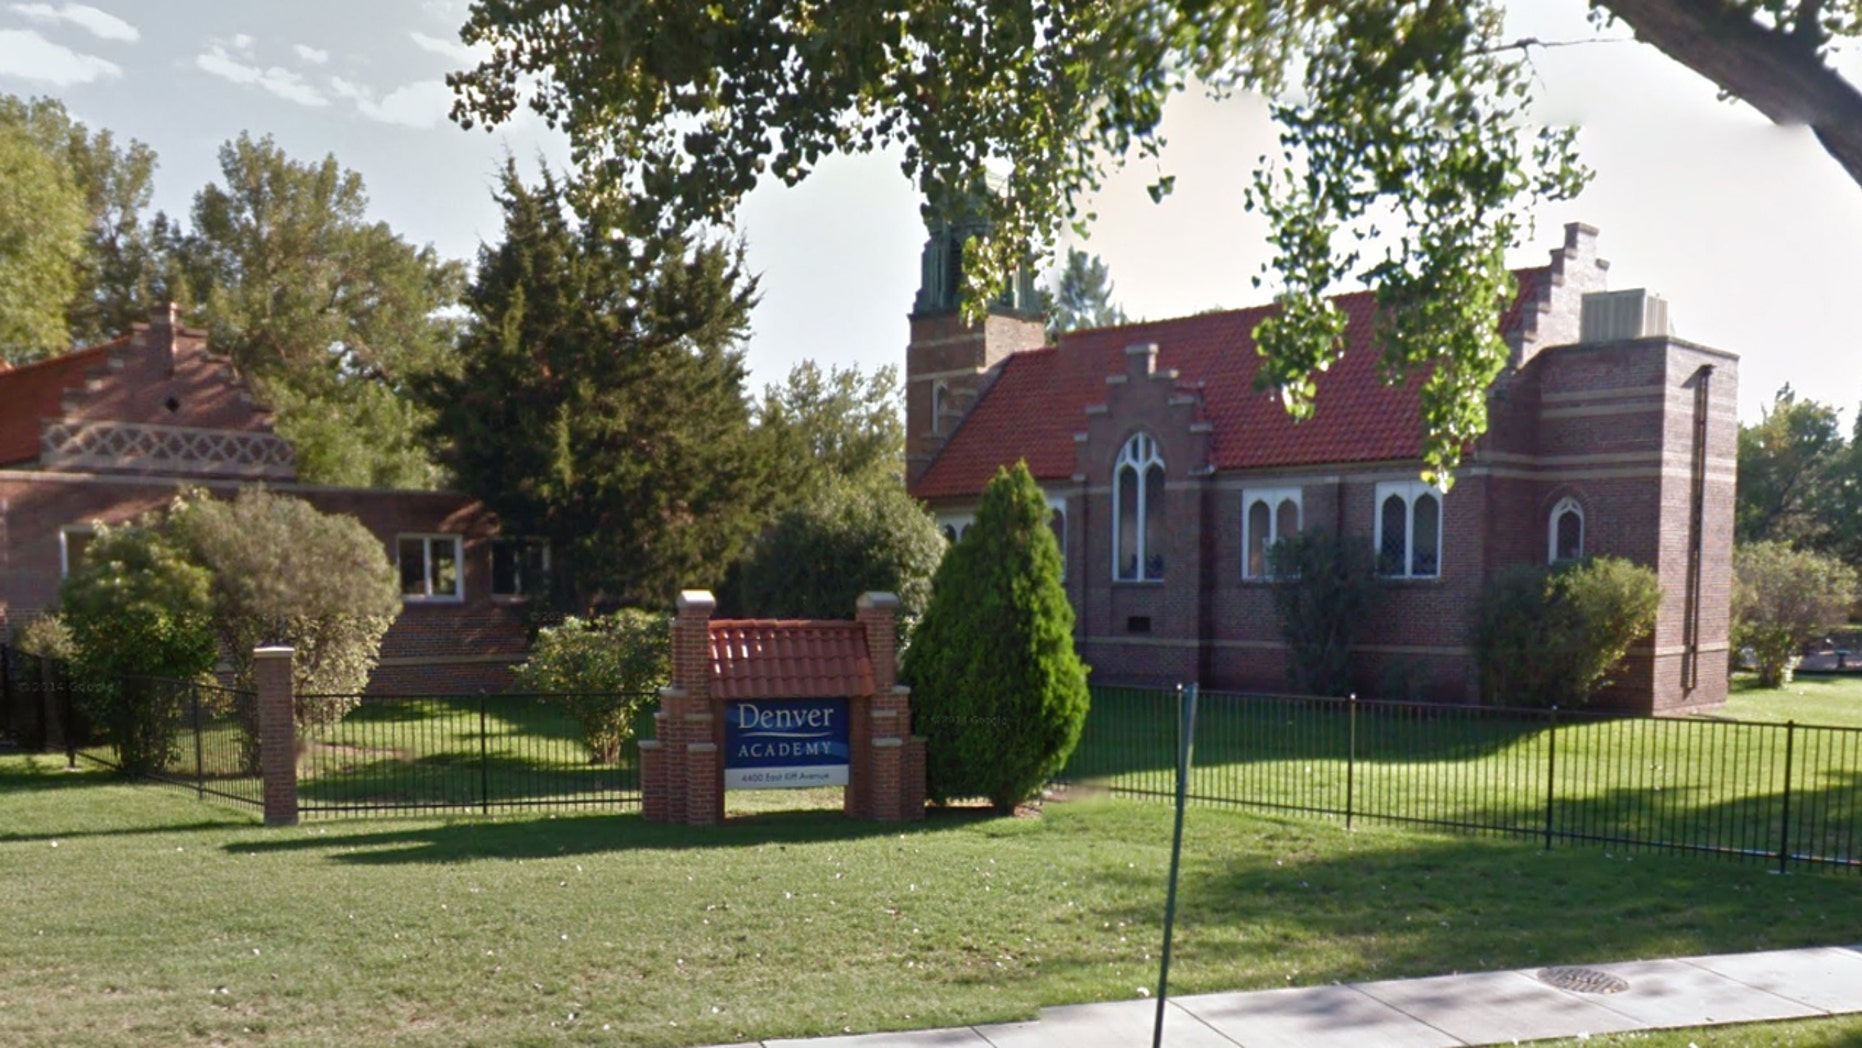 The Denver Academy in Denver, Colorado.